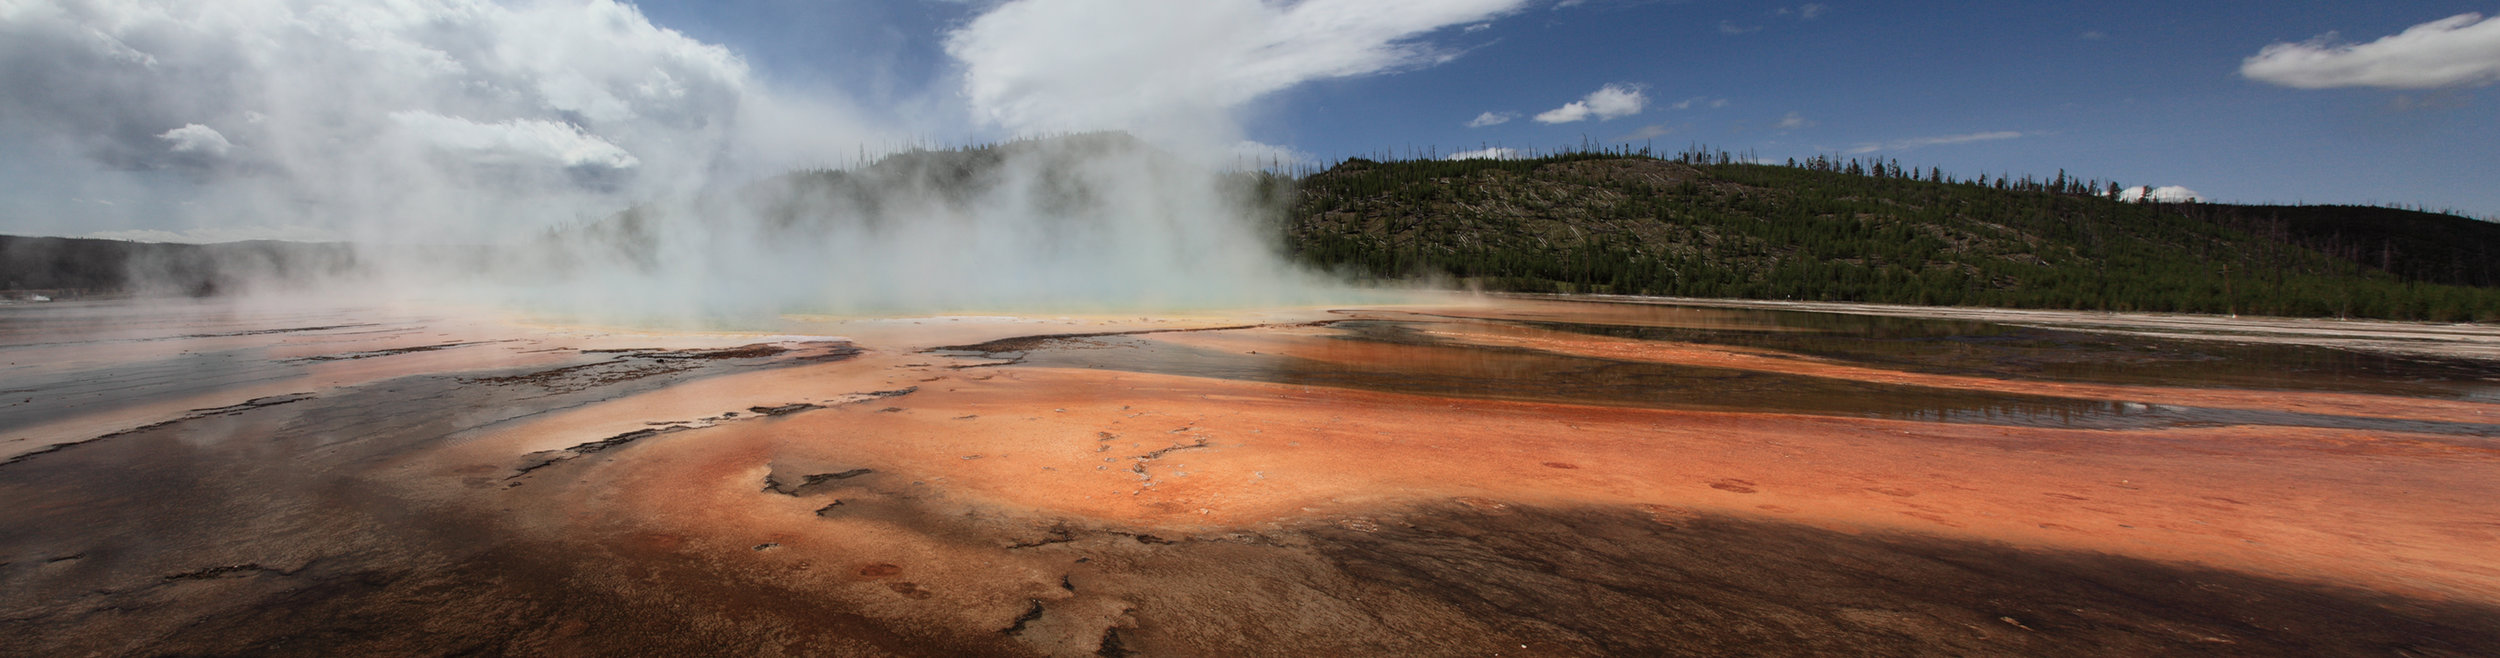 midway geyser basin 40_10.jpg